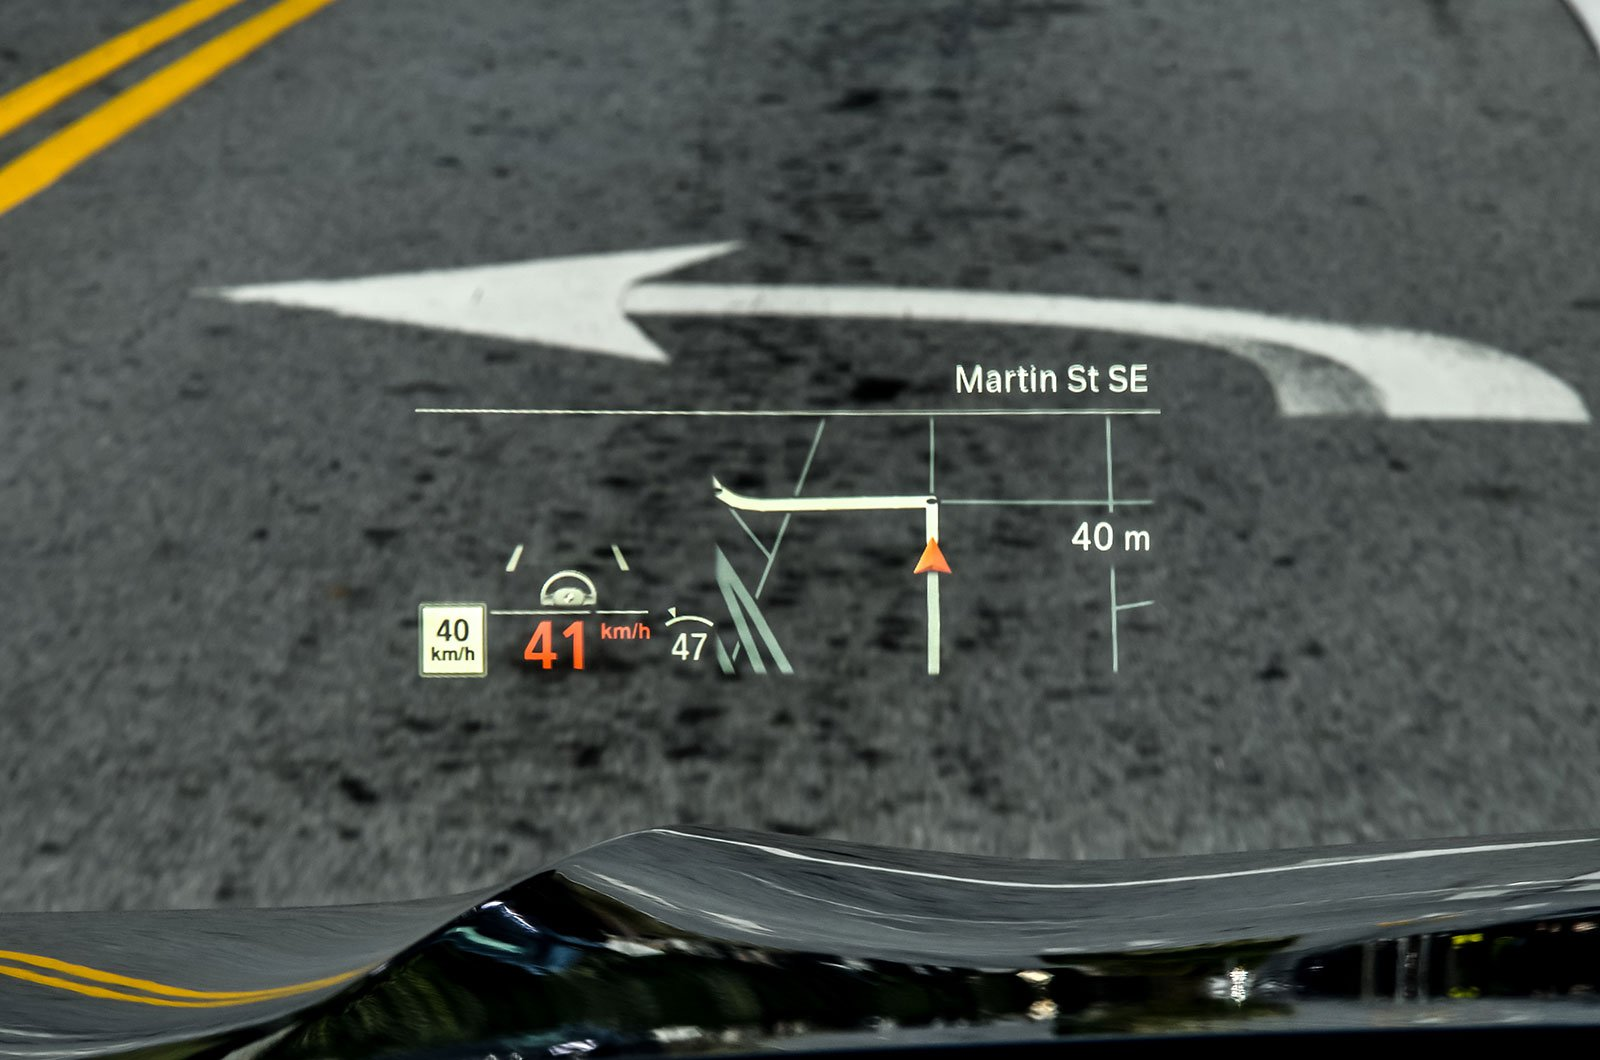 BMW X5 head-up display